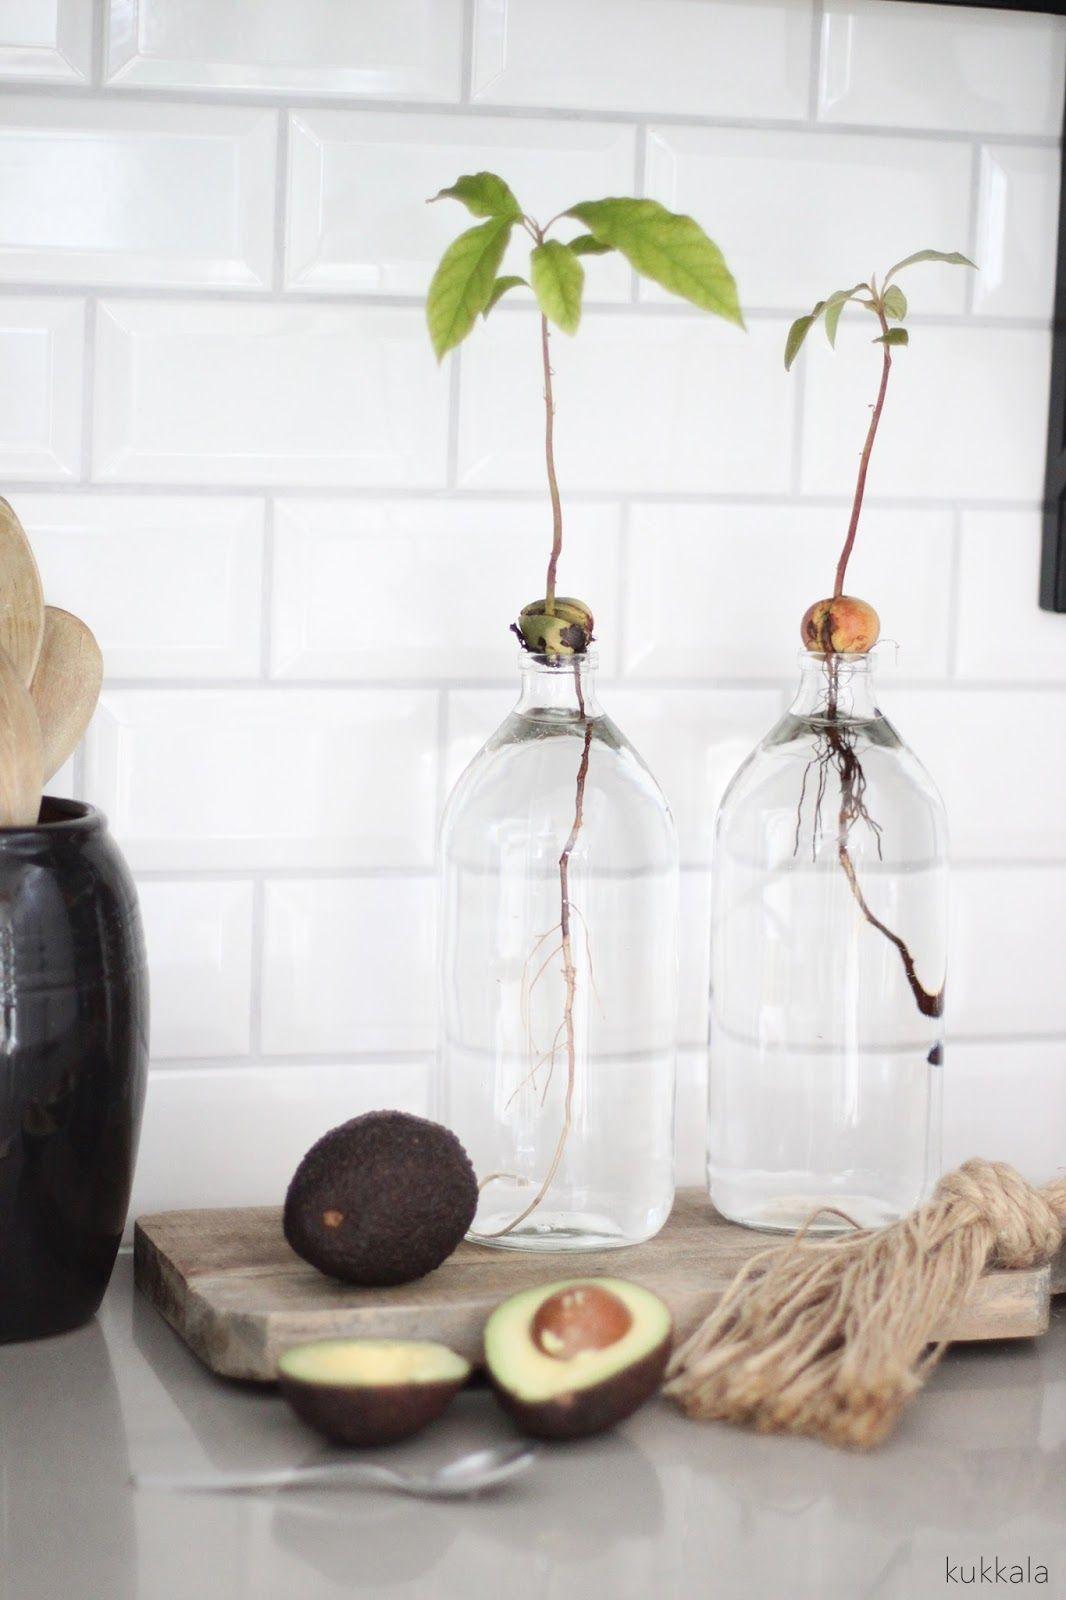 Avokado on niit perinteisi siemeni jotka hedelmn symisen avocado plant in water vase reviewsmspy